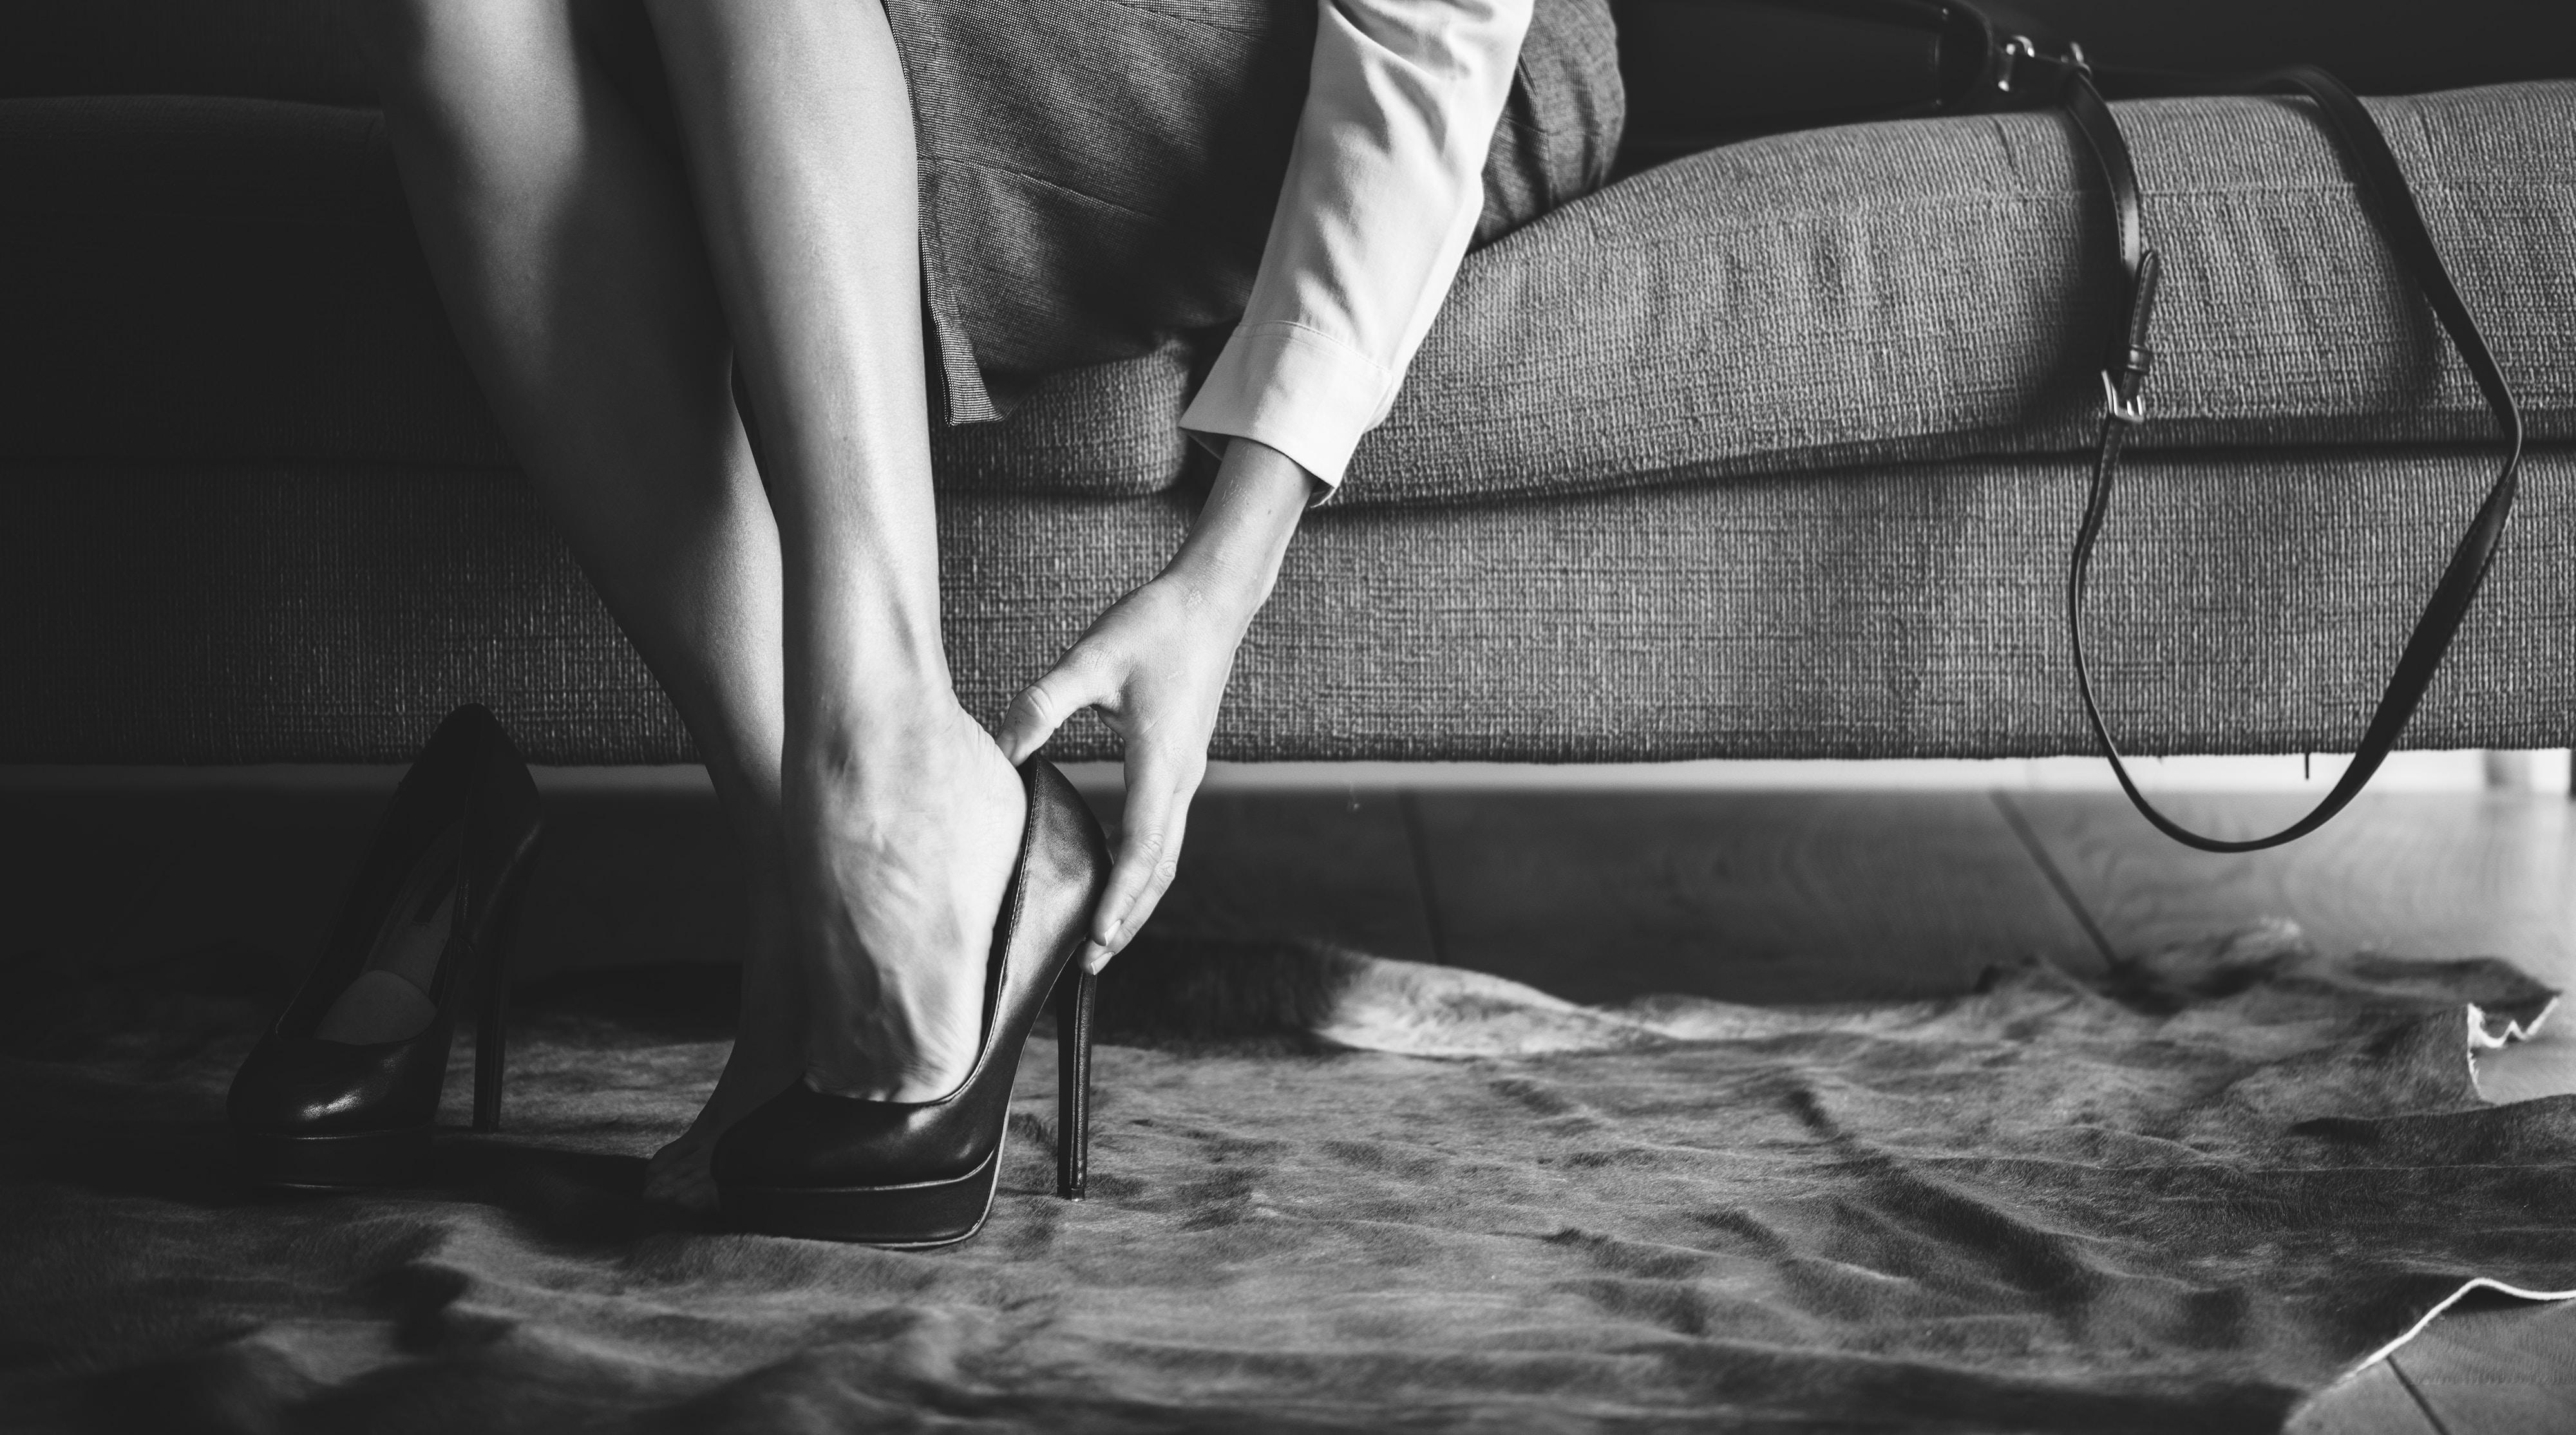 sitting woman wearing black stiletto pump